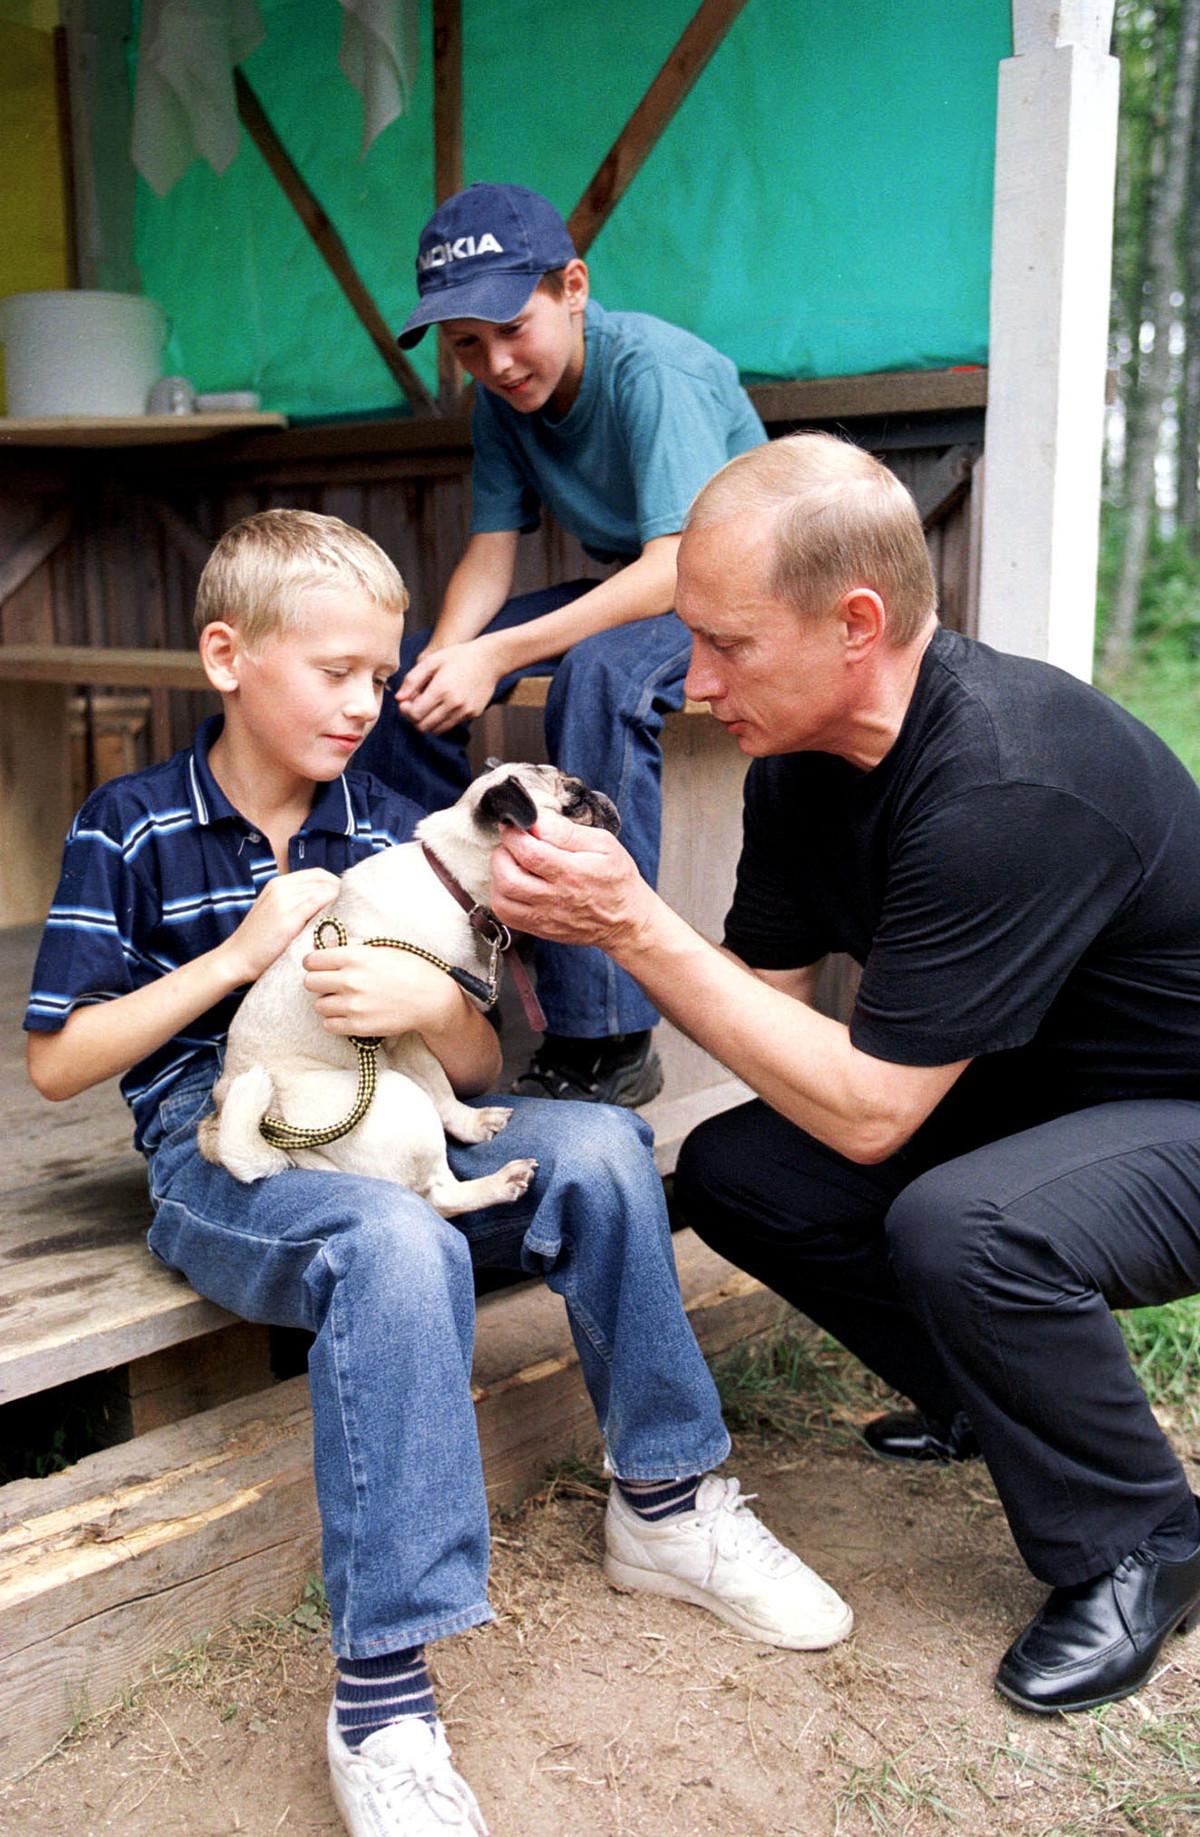 Vladimir Poutine en vacances